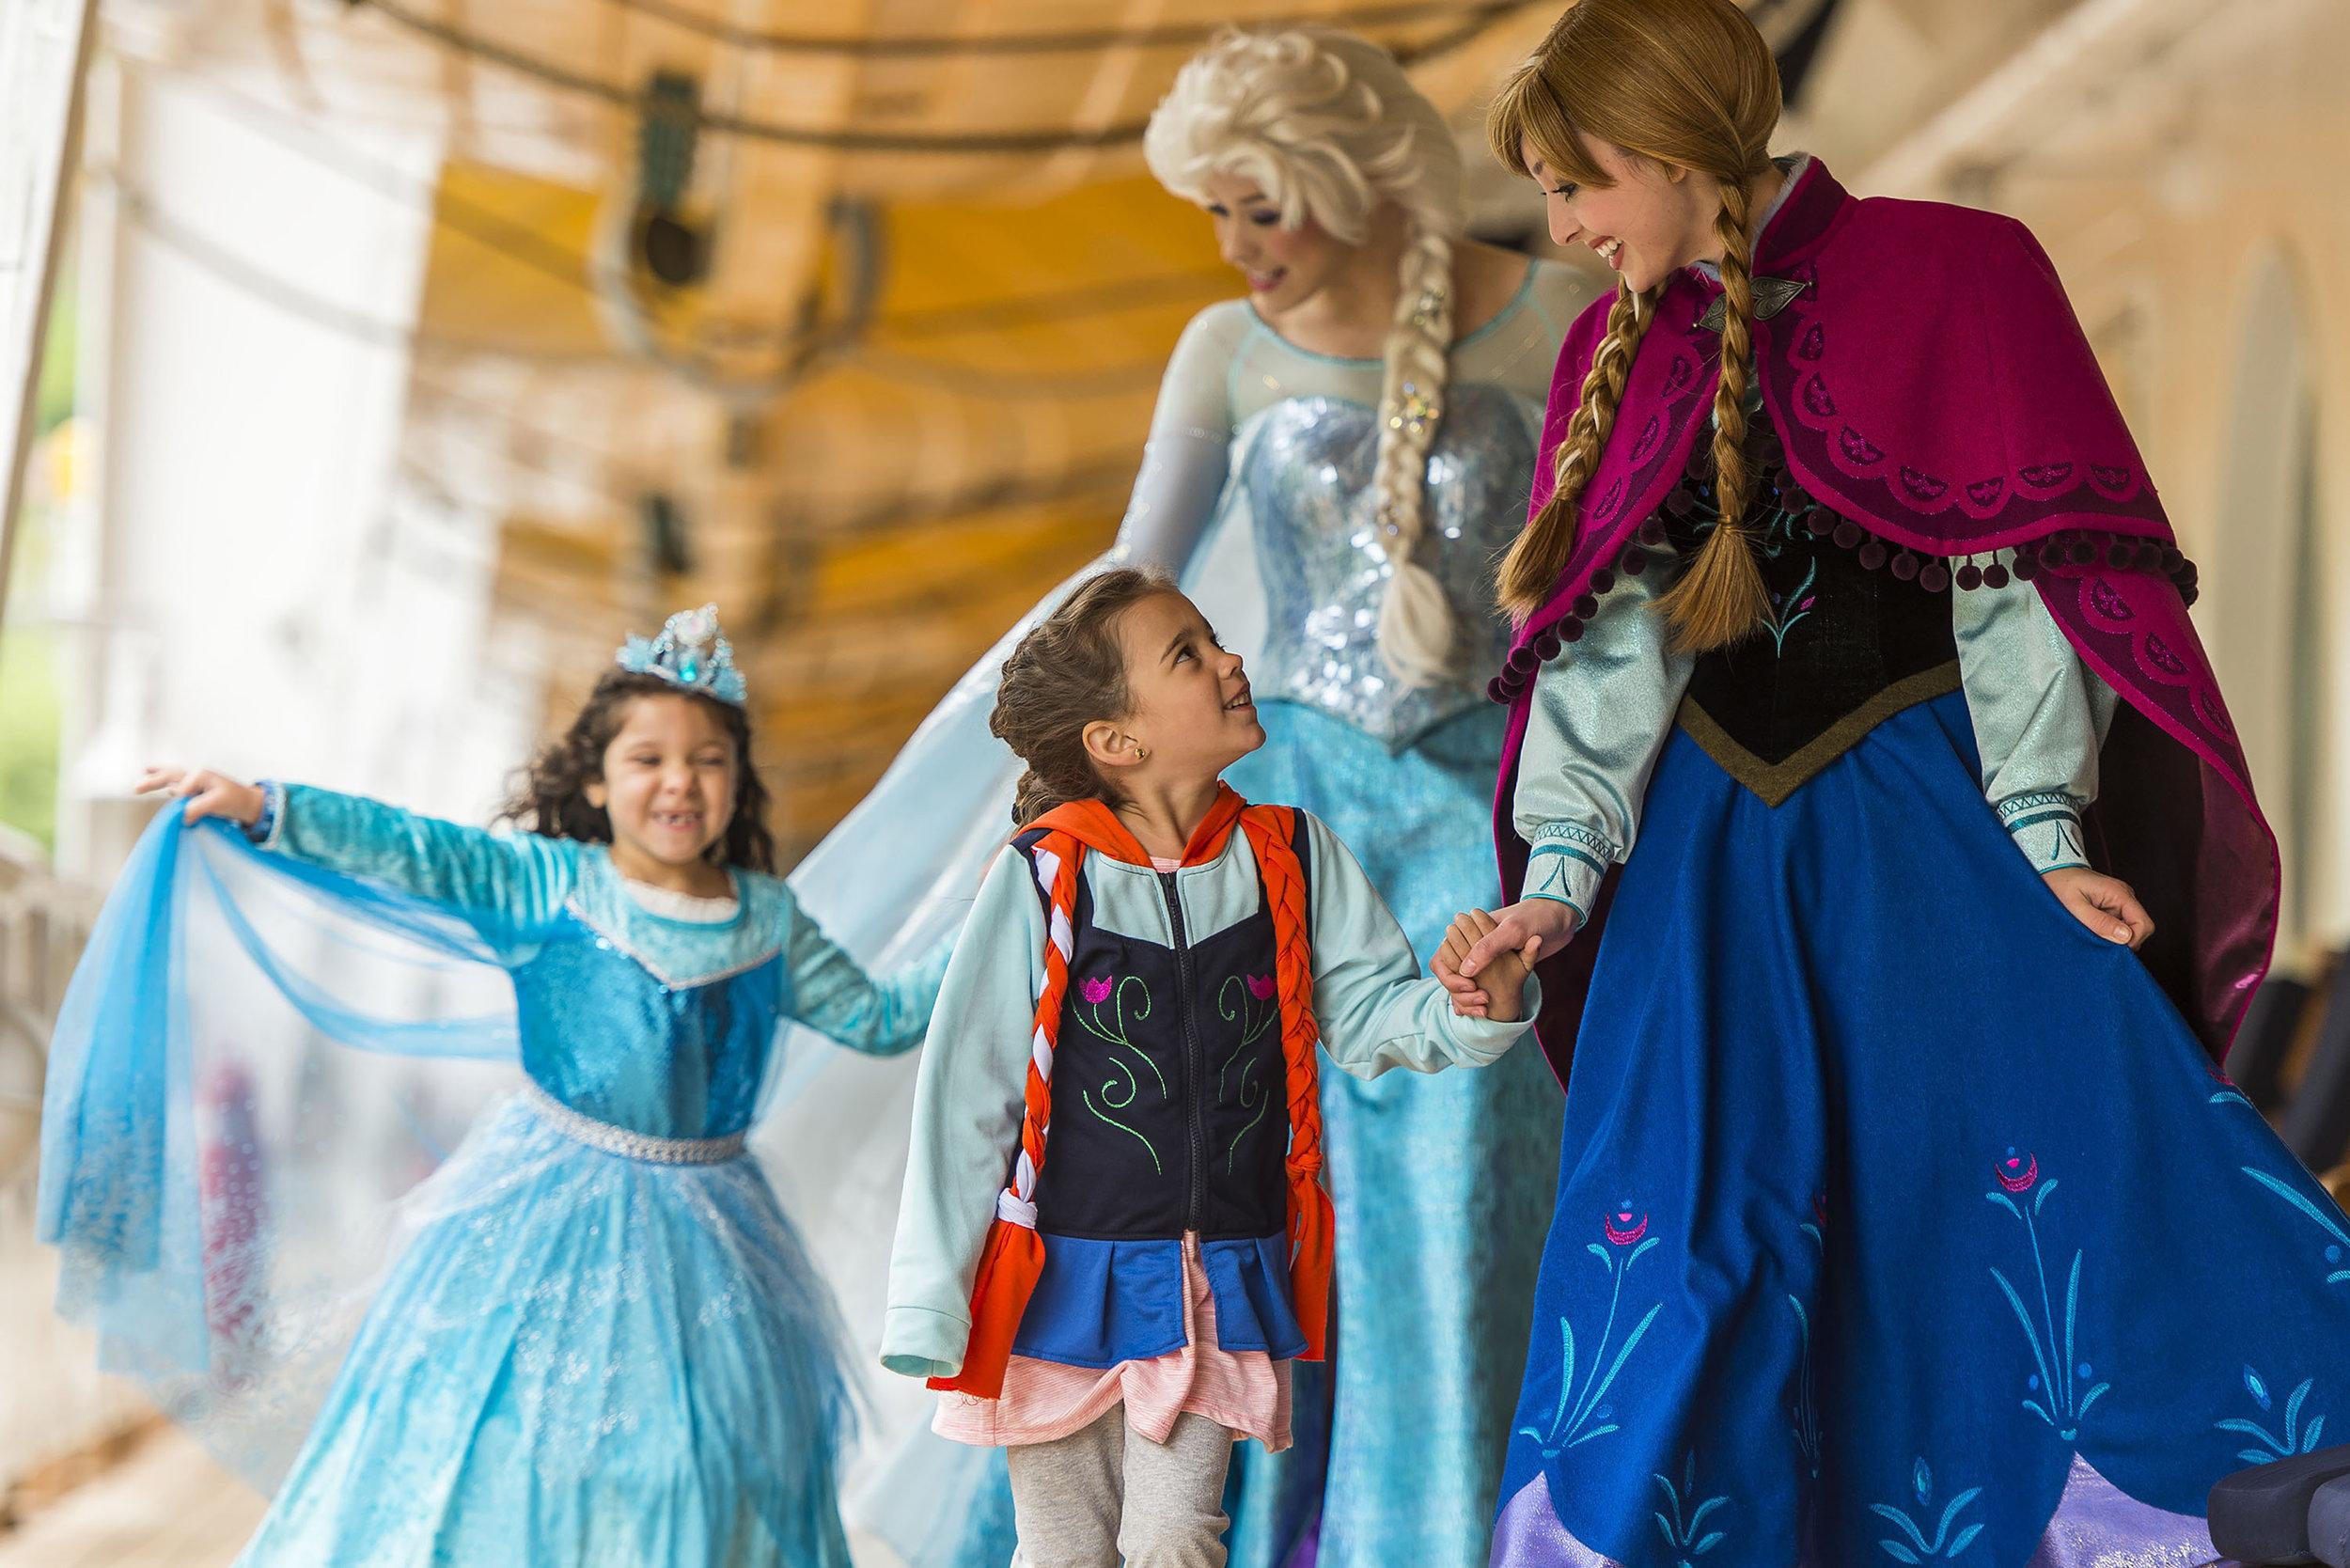 3/How to meet the princesses